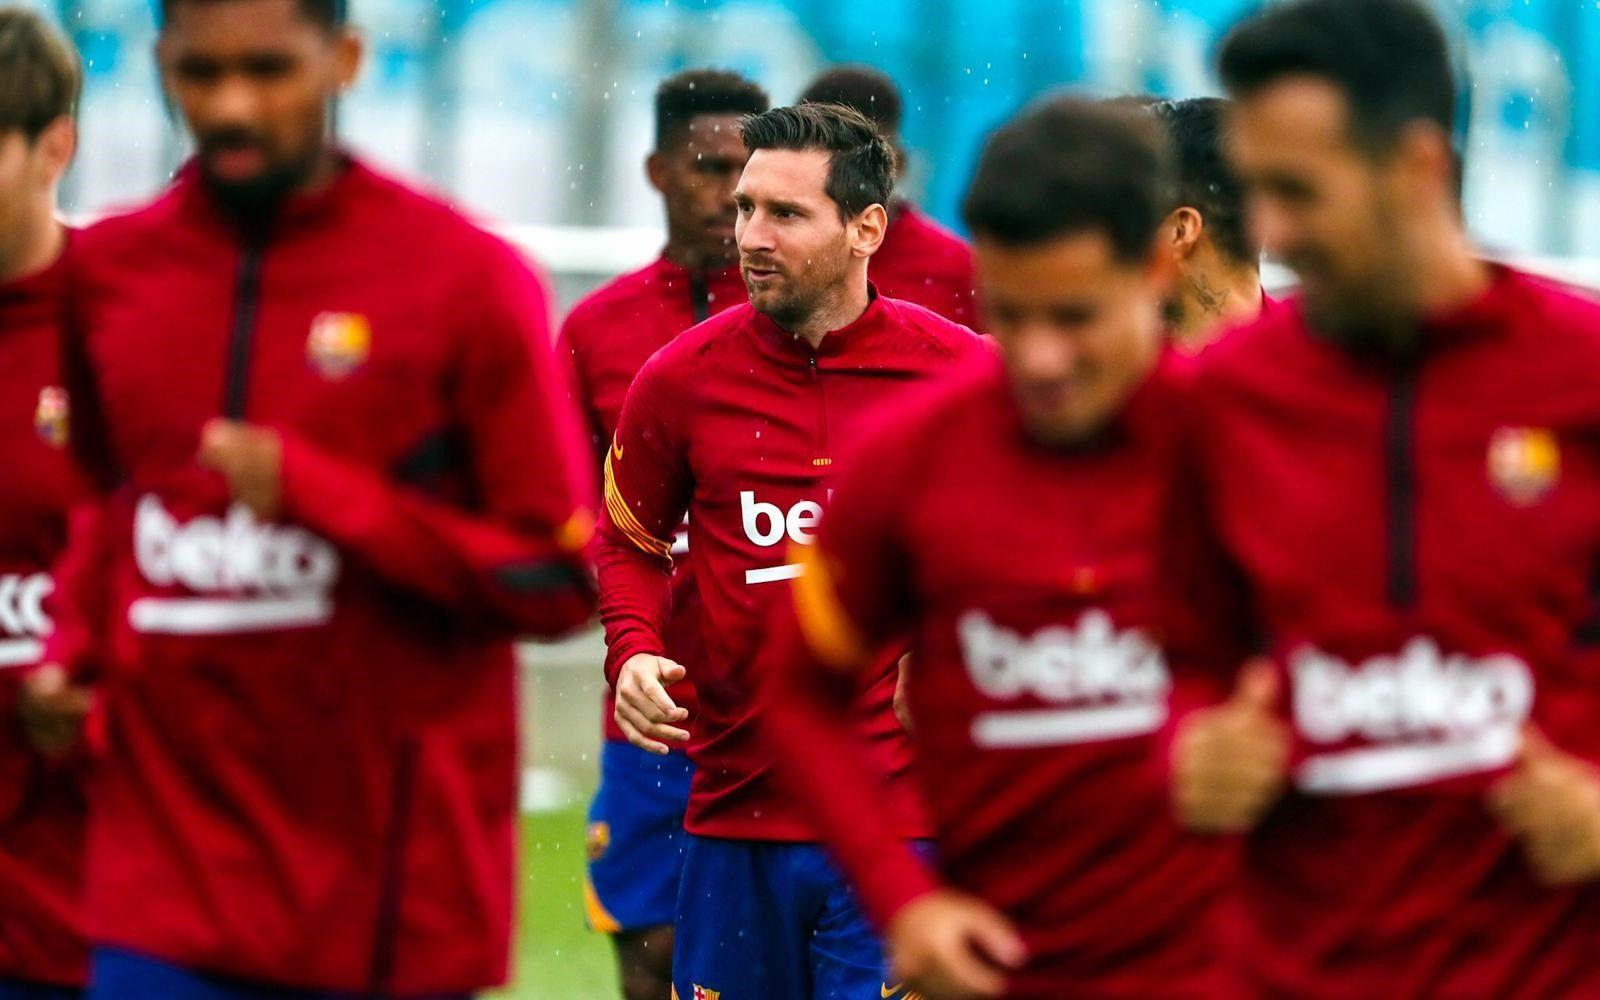 Lionel Messi estuvo cerca de irse del Barcelona